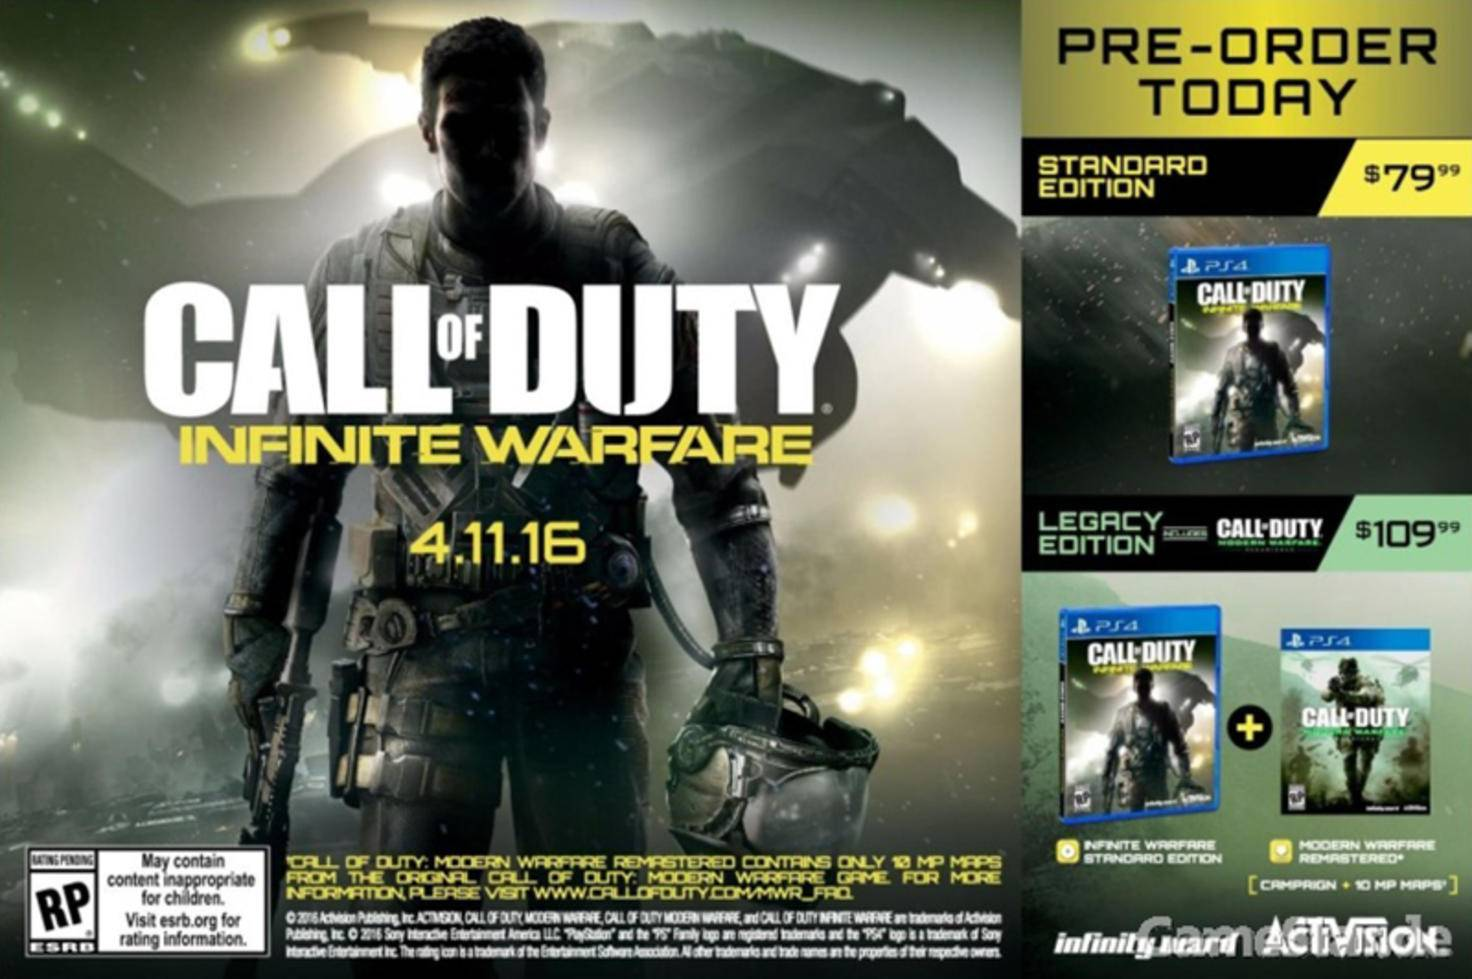 Call-of-duty-infinite-warfare-leak